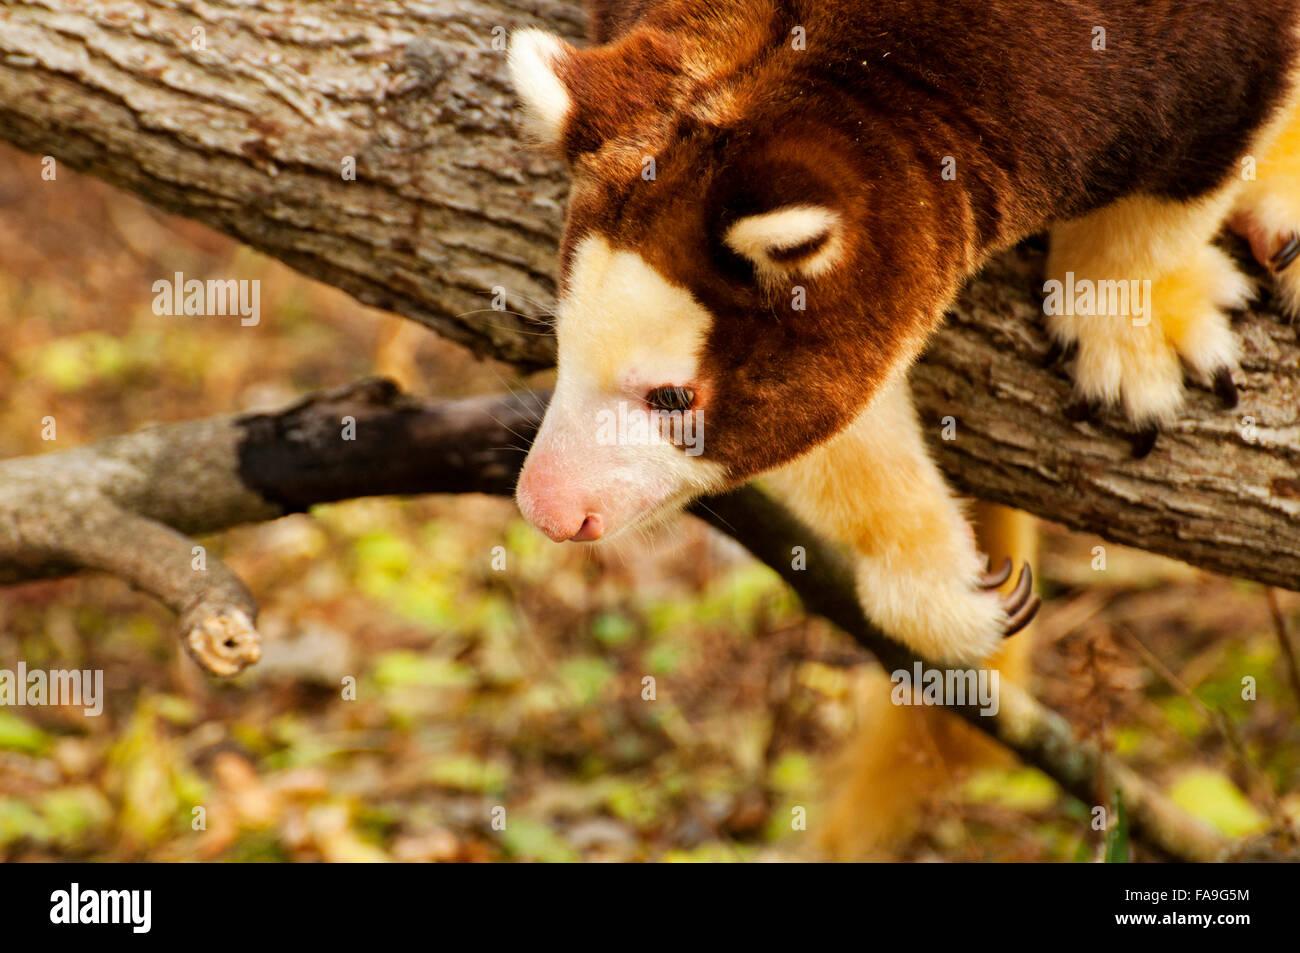 Tree Kangaroo on limb - Stock Image